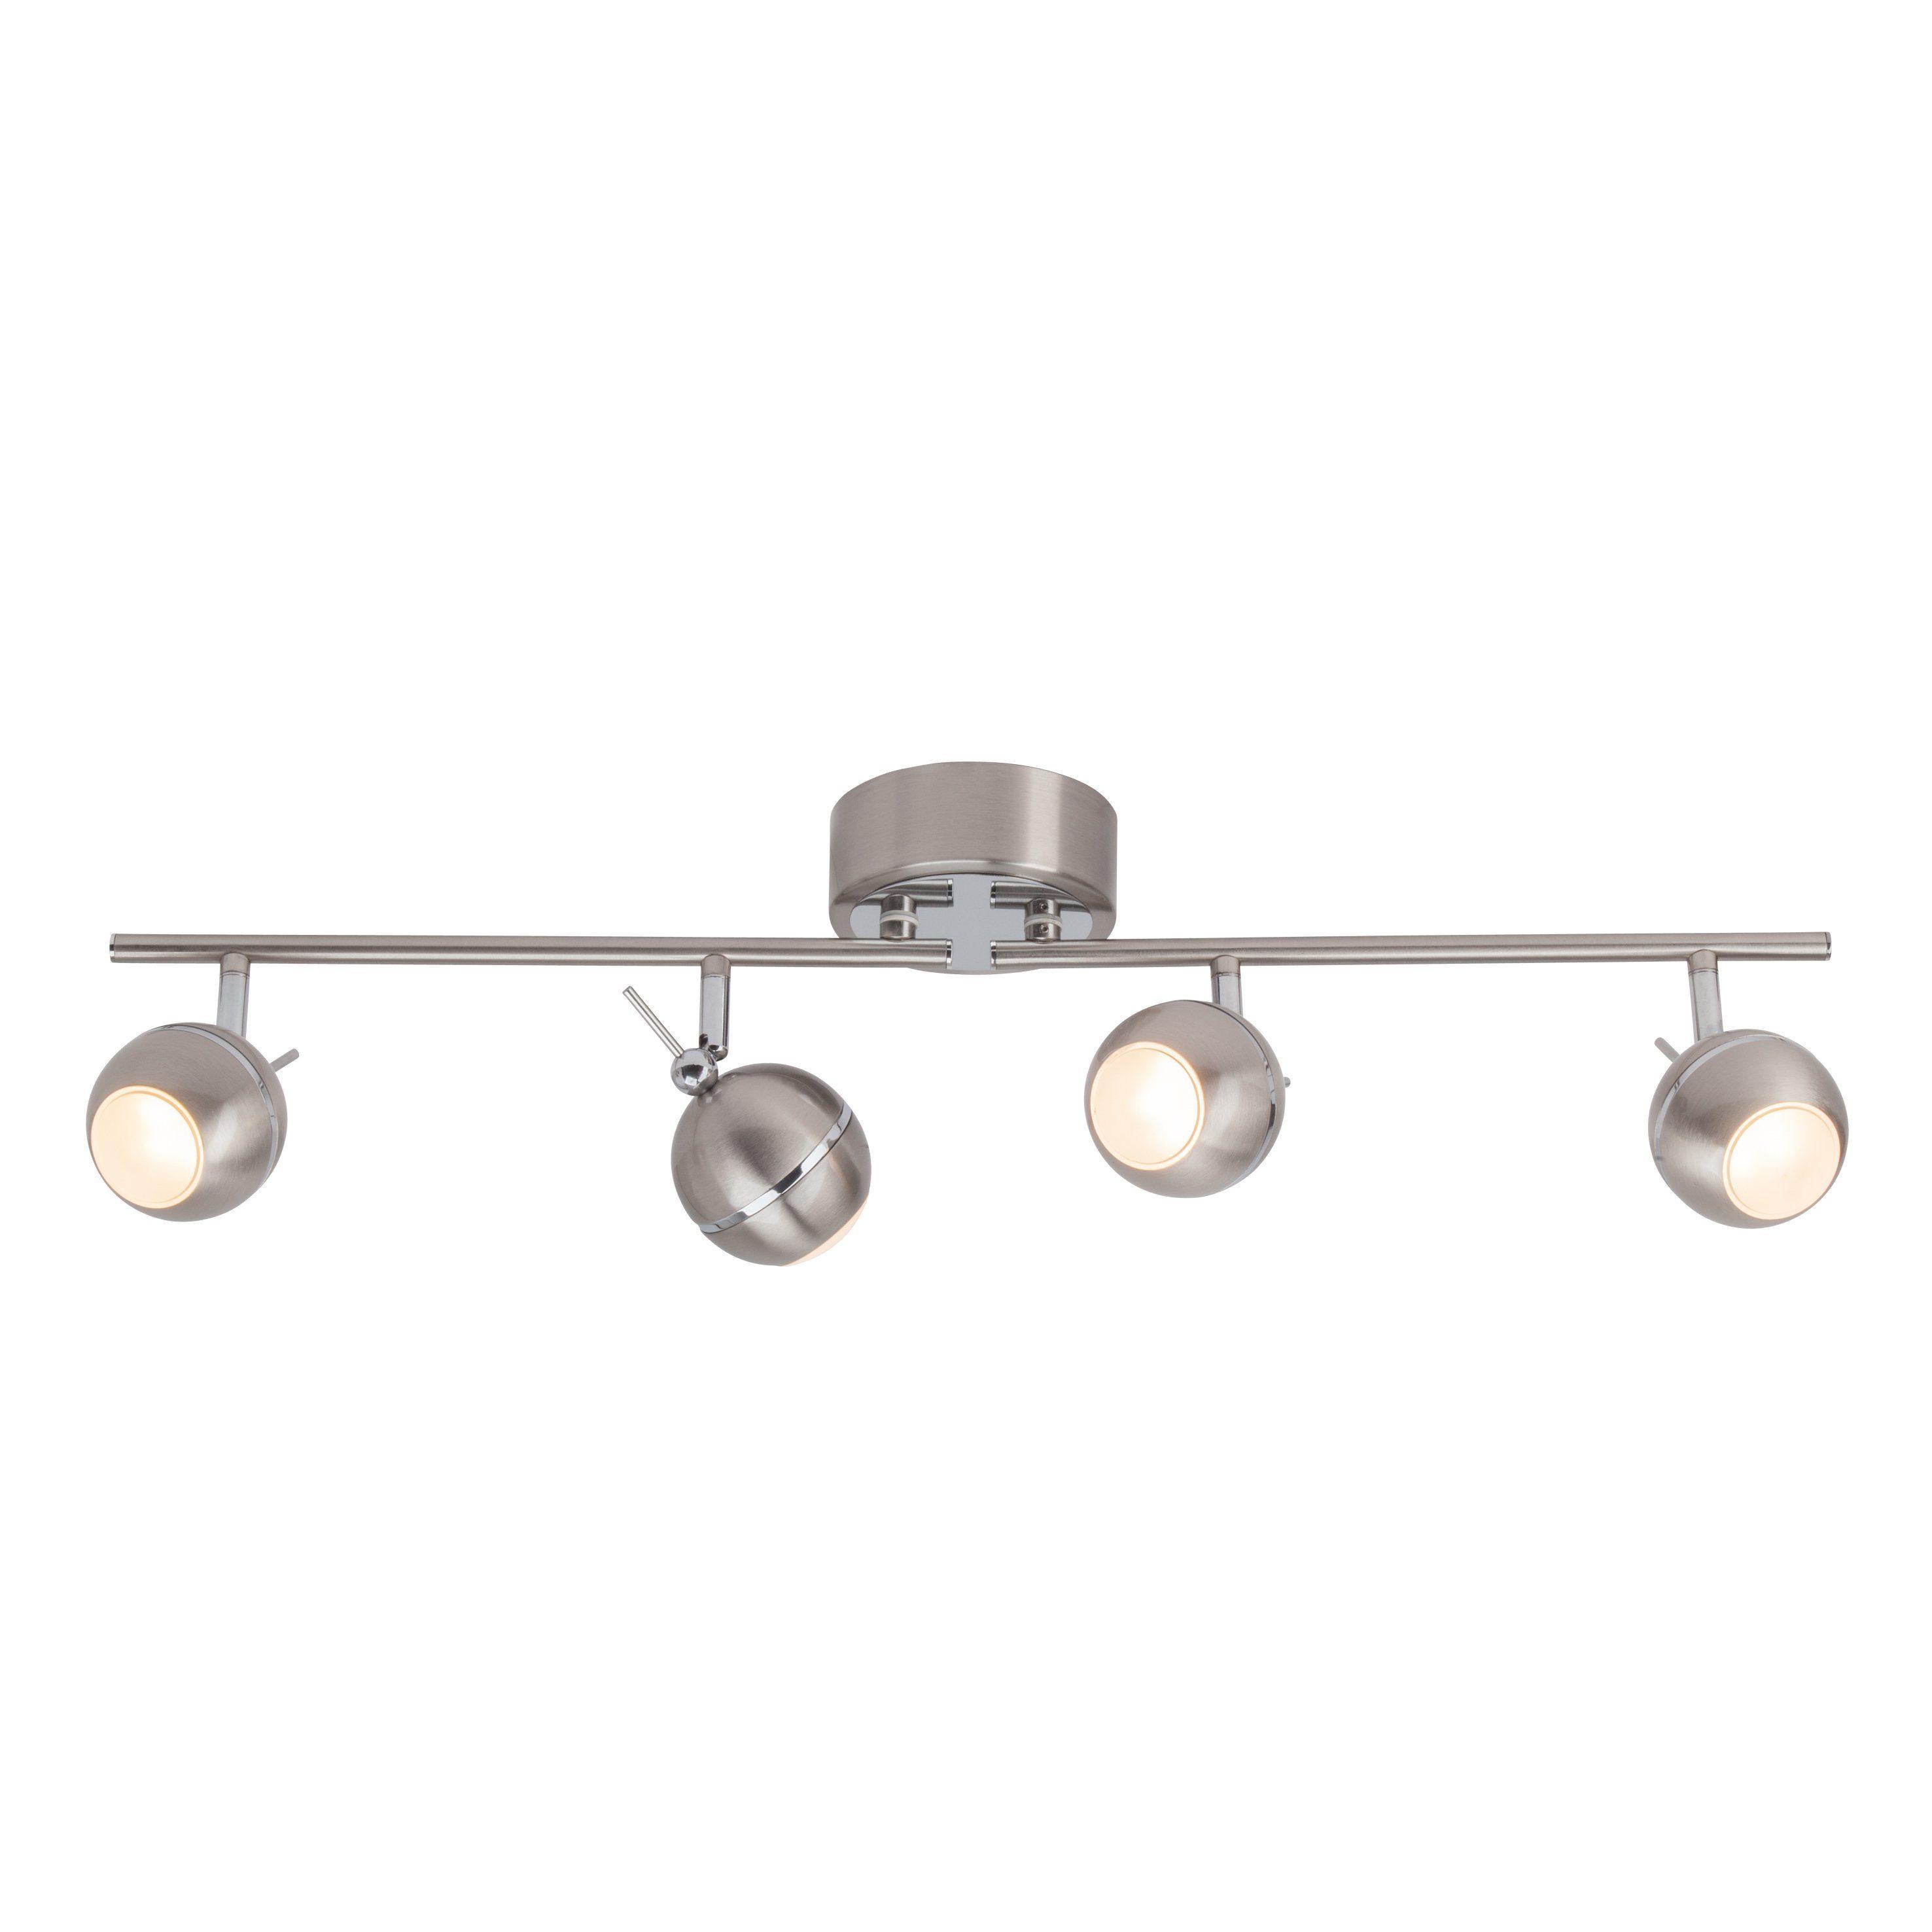 Brilliant Leuchten Comb LED Spotrohr, 4-flammig eisen/chrom